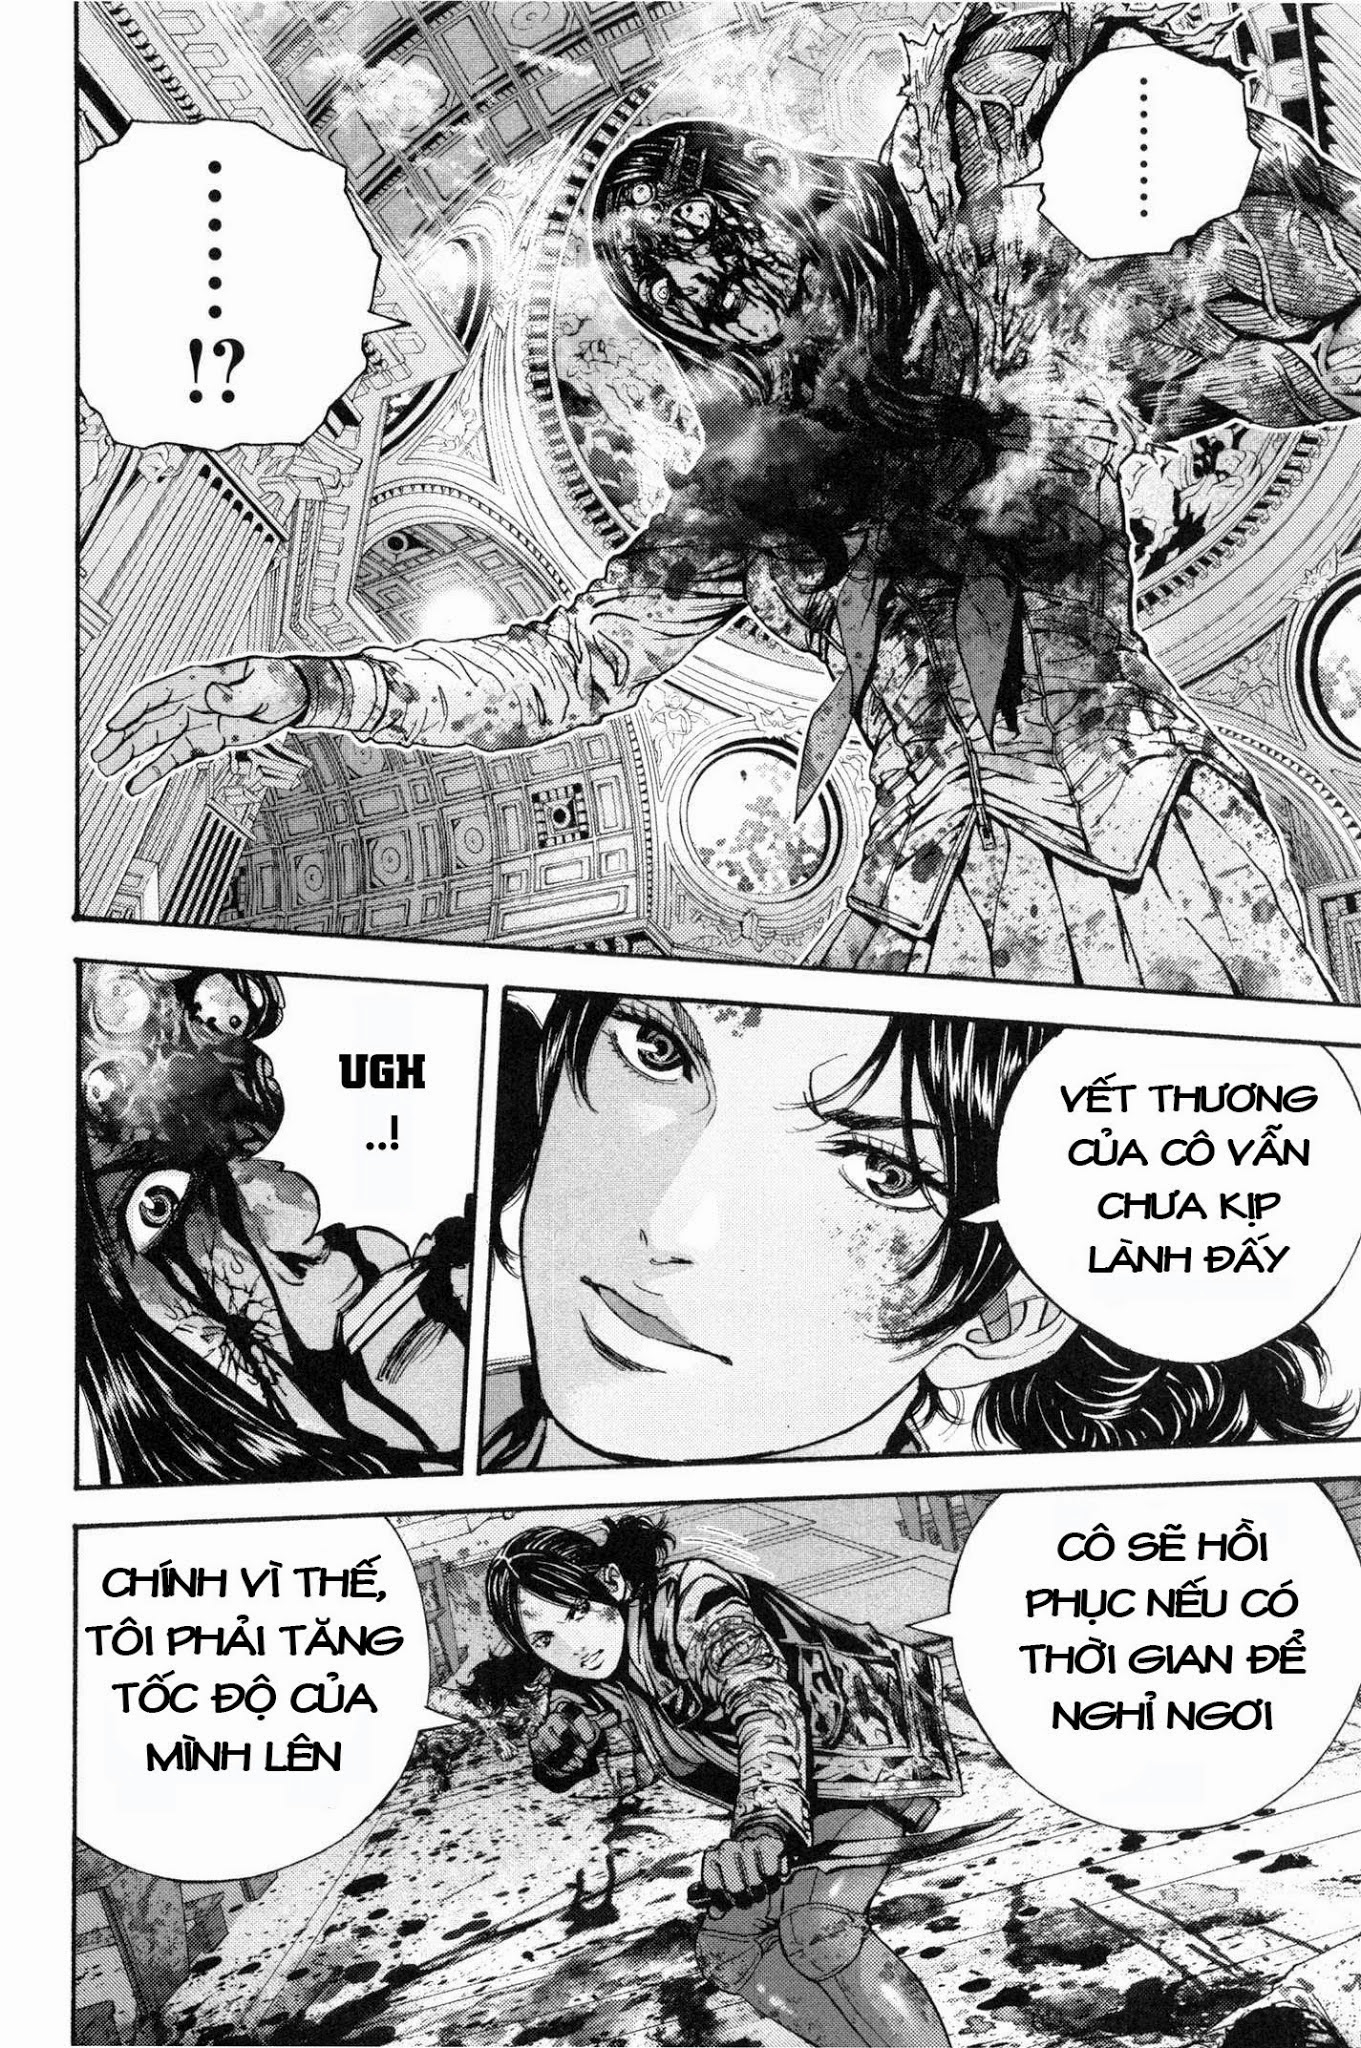 Resident Evil Biohazard Marhawa desire chapter 27: kén nhộng trang 12